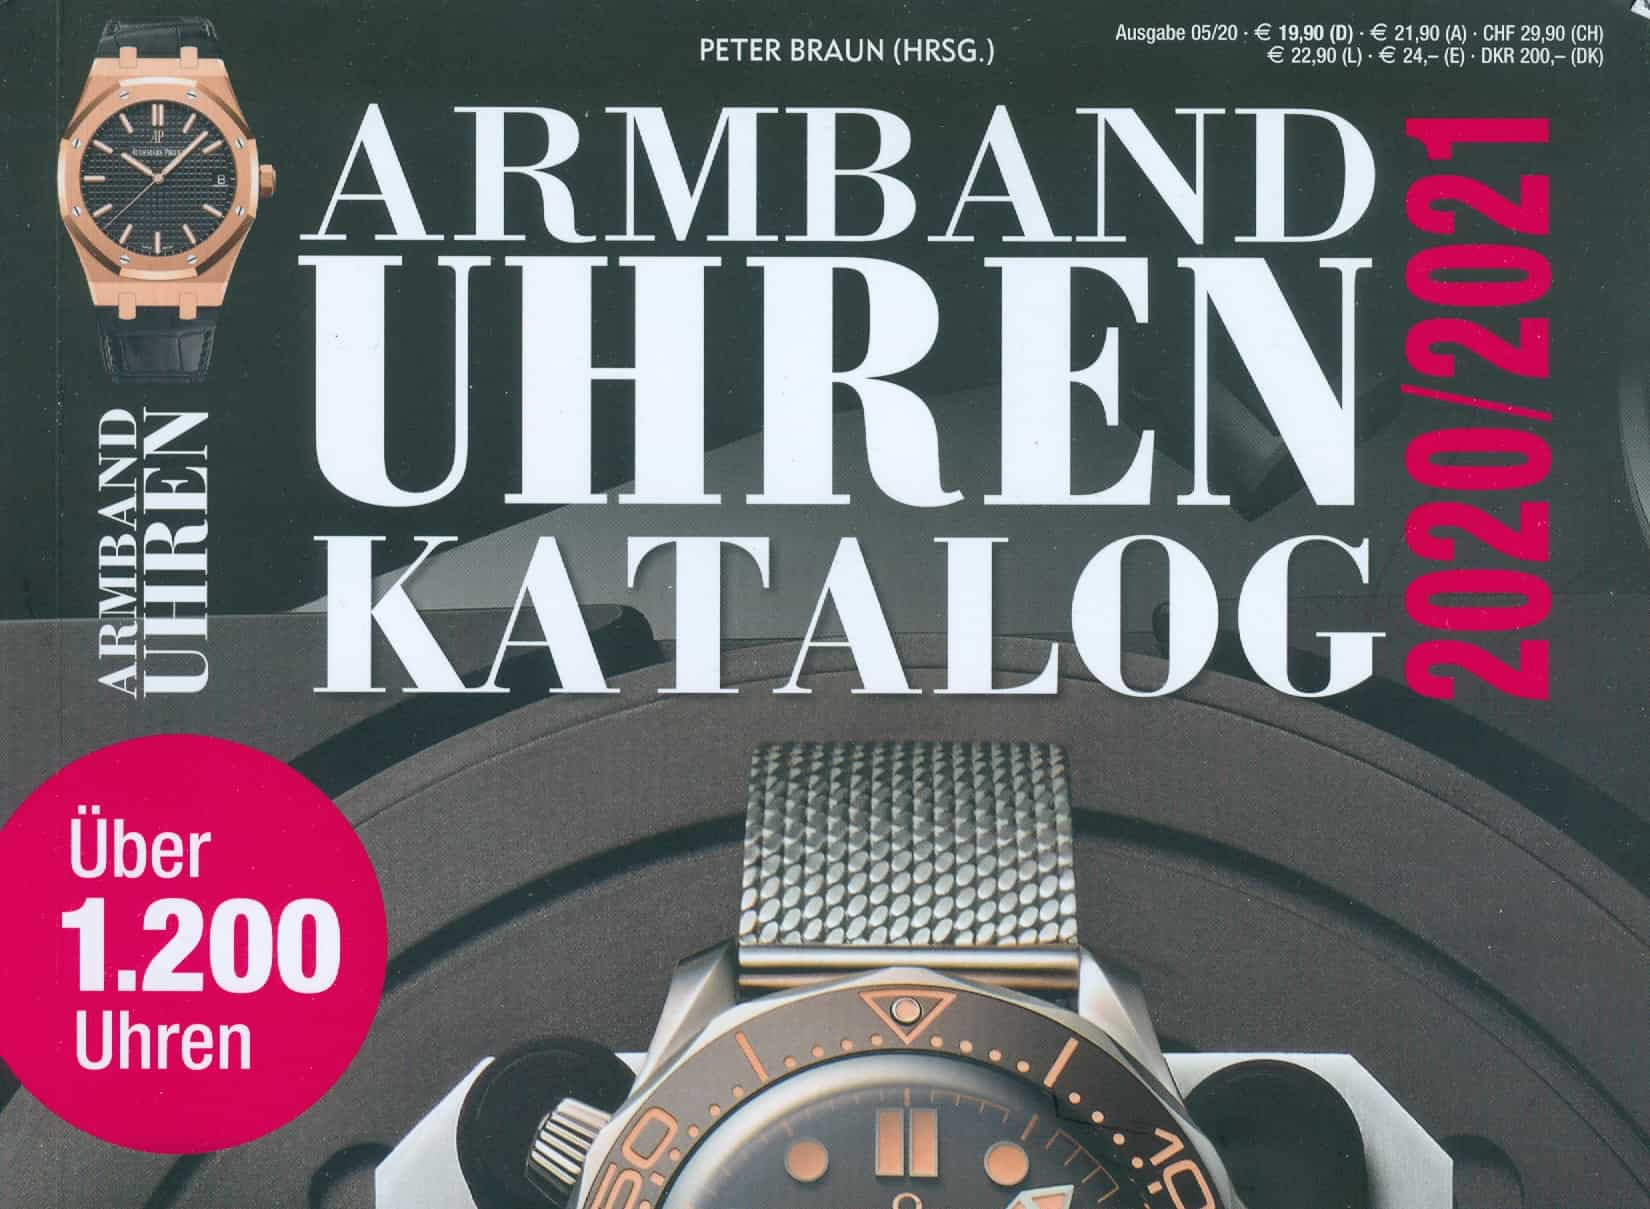 Armbanduhren Katalog 2020/2021Armbanduhren Katalog 2020/2021